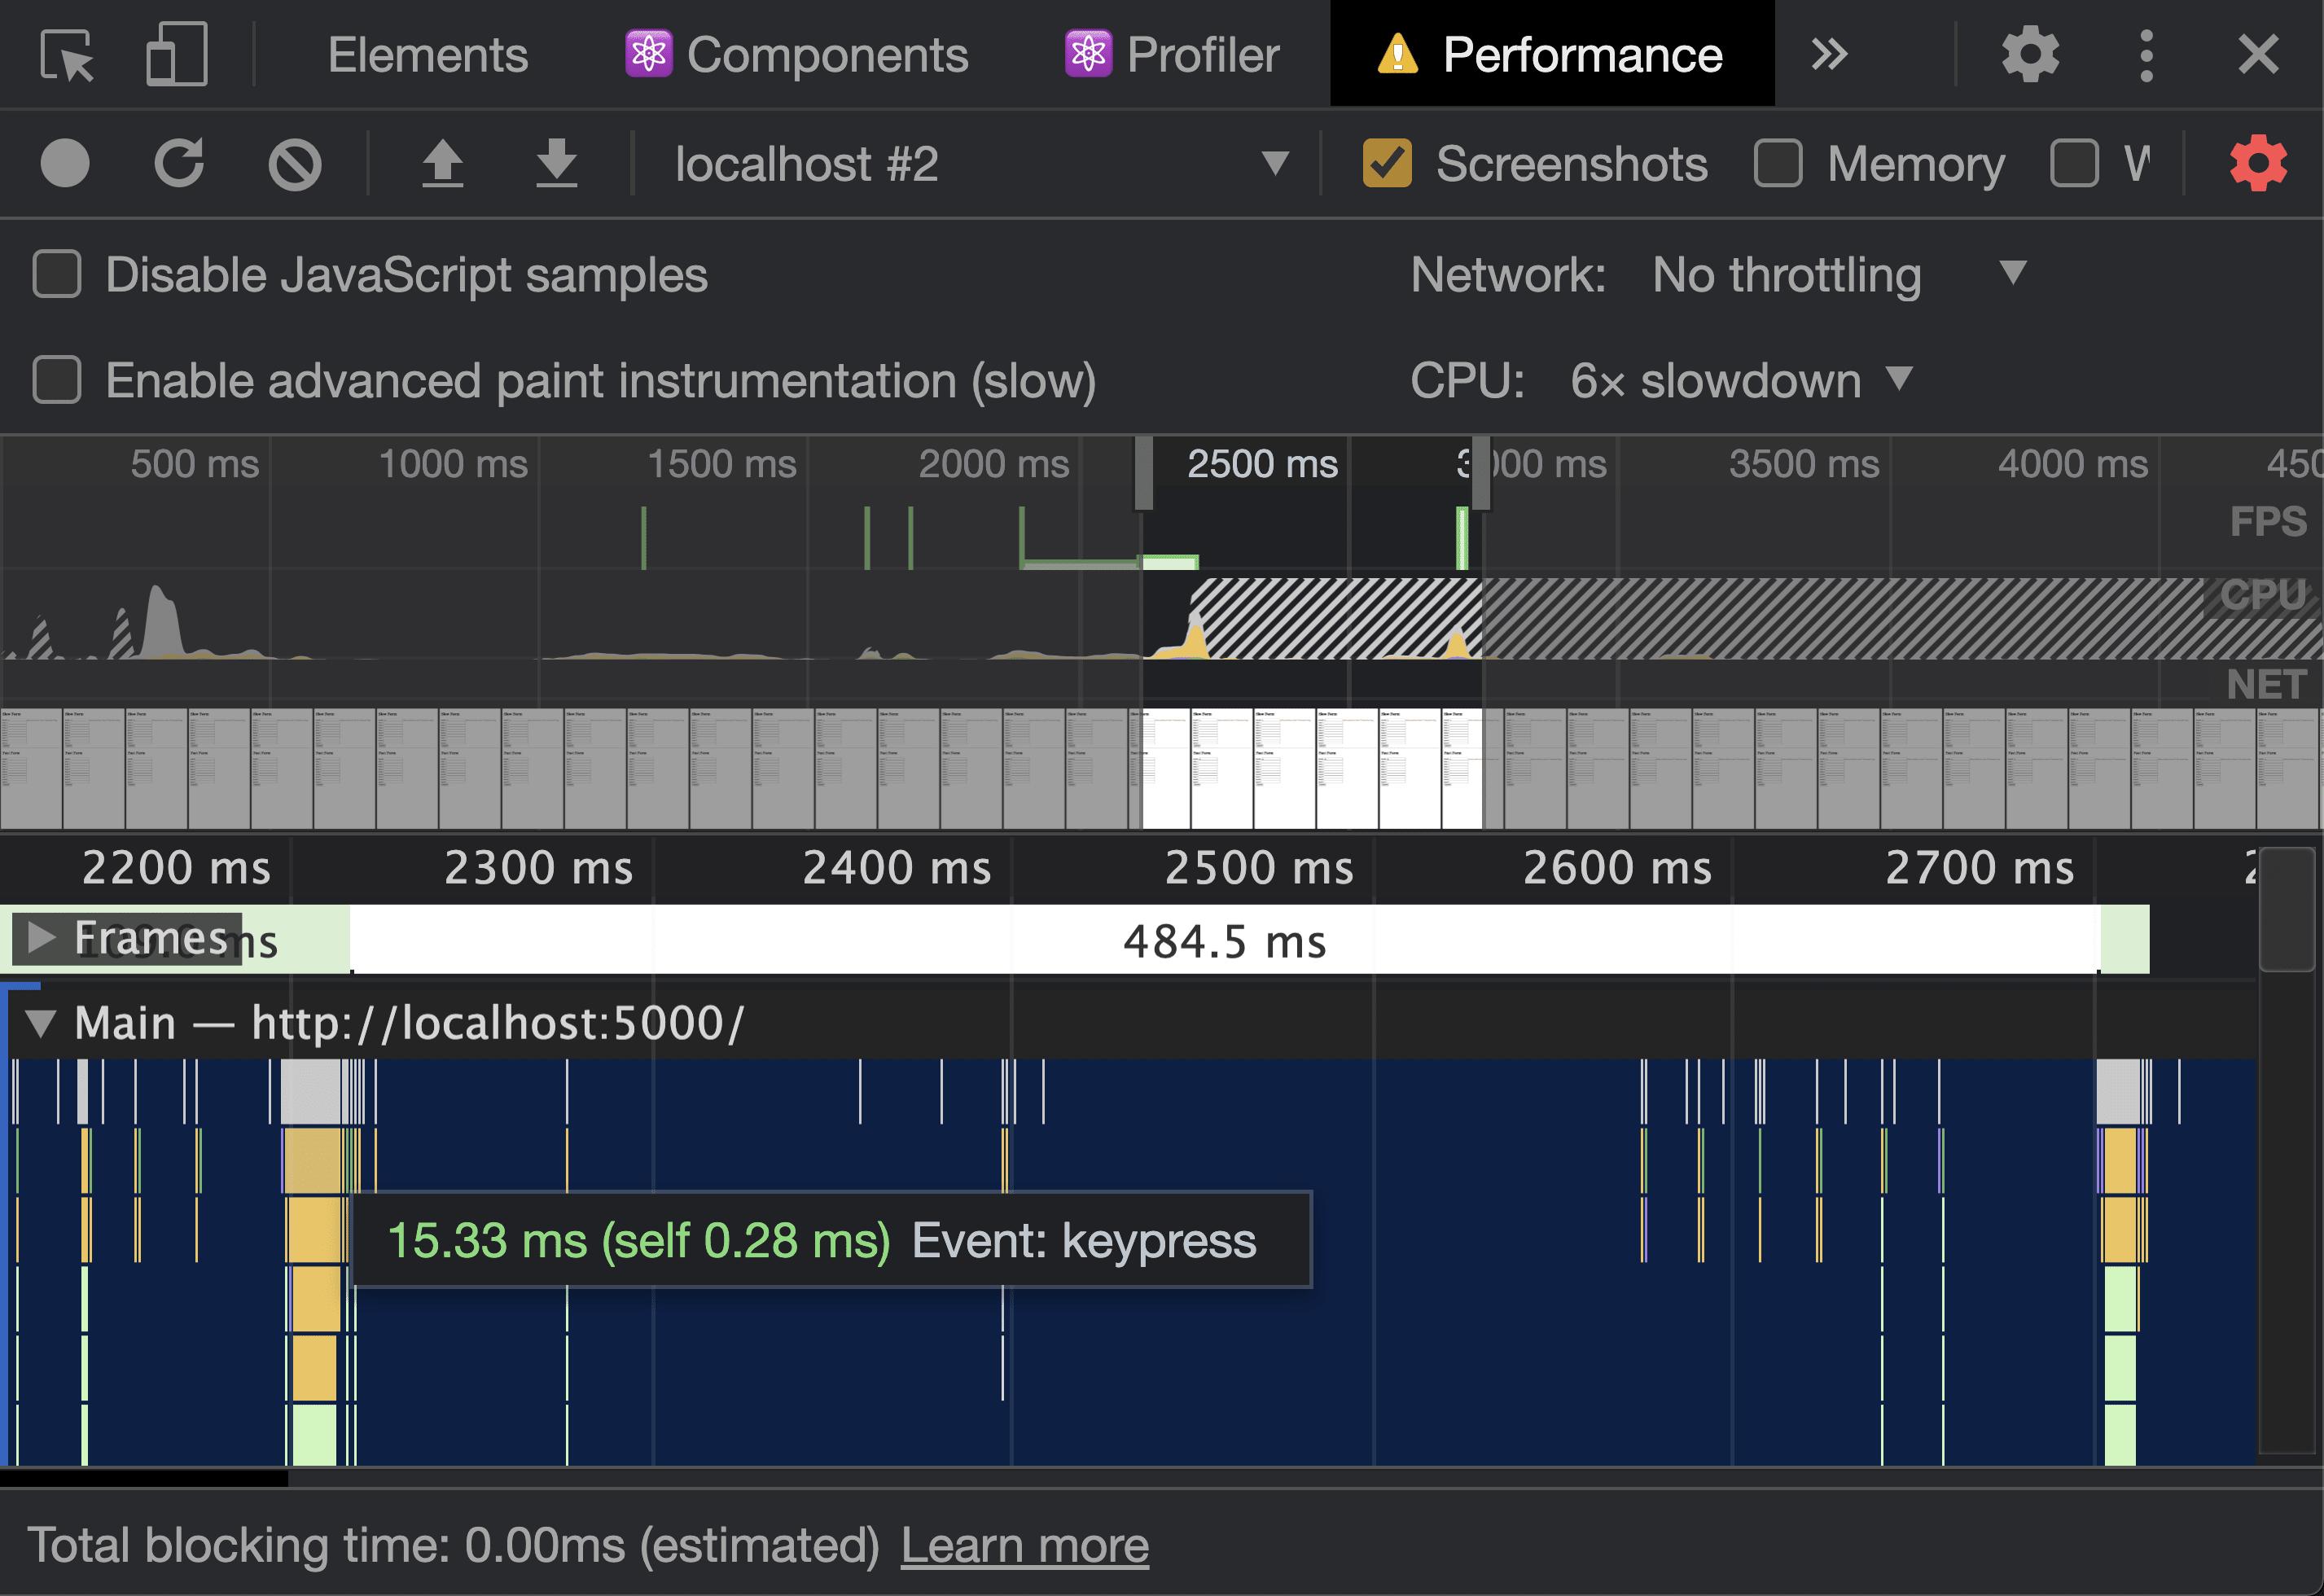 Chrome DevTools Performance Tab showing 15.33 milliseconds on a keypress event